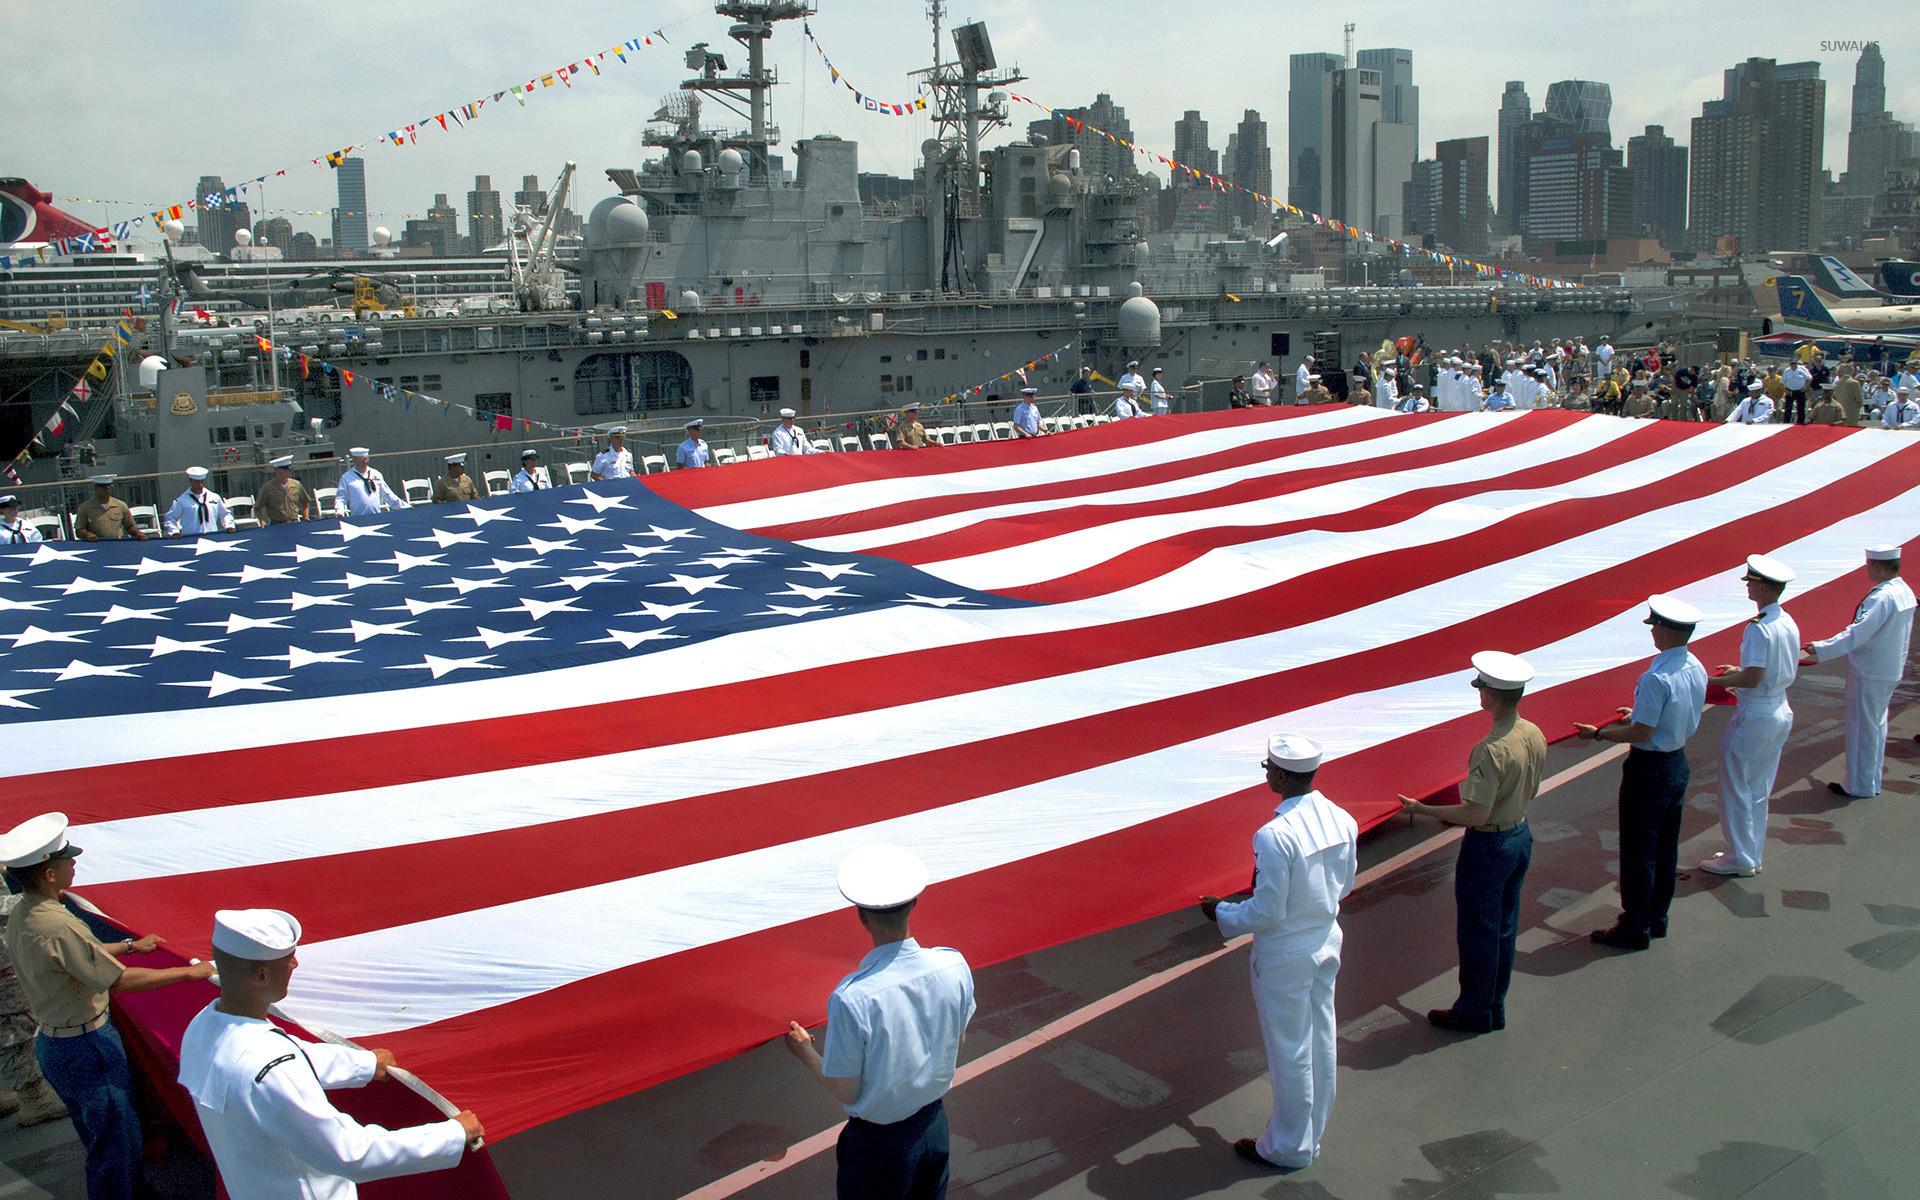 USA flag in Intrepid Sea, Air & Space Museum wallpaper jpg